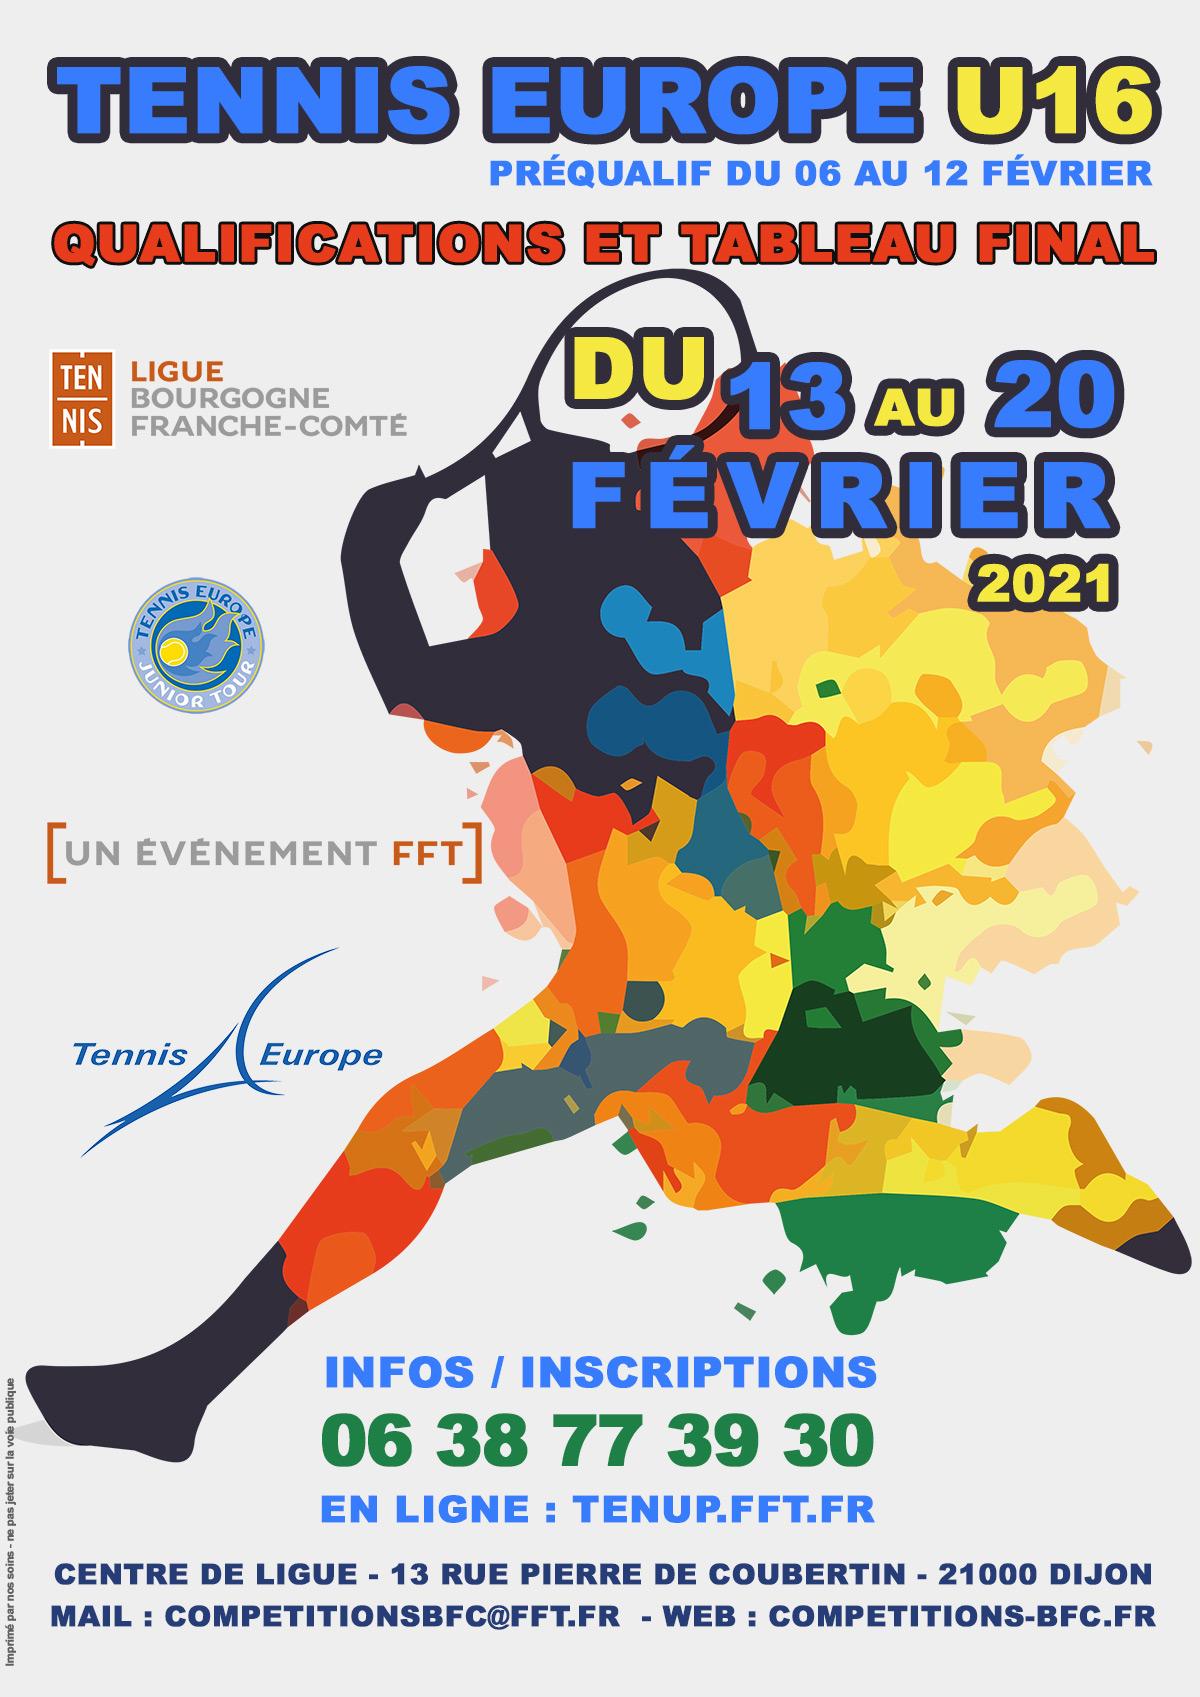 Les Petits Ducs Tennis Europe U16 à Dijon 2021